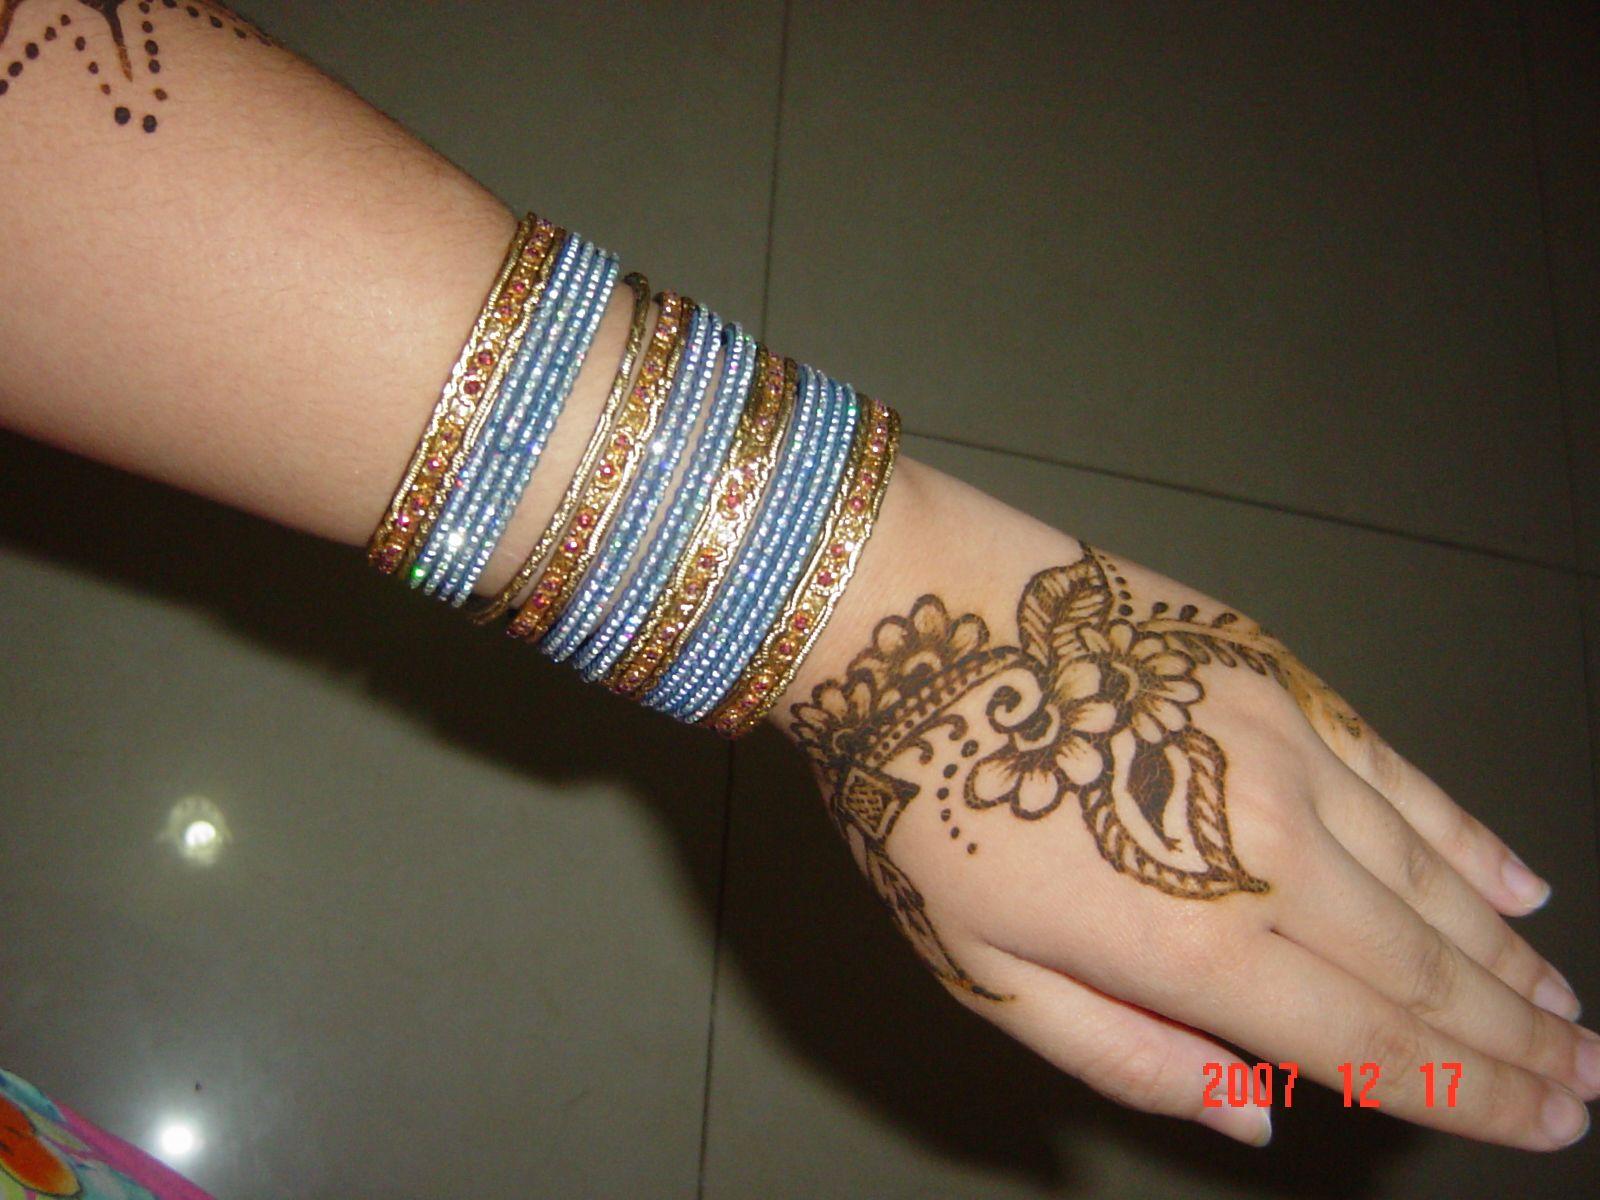 Indian tattoo designs often